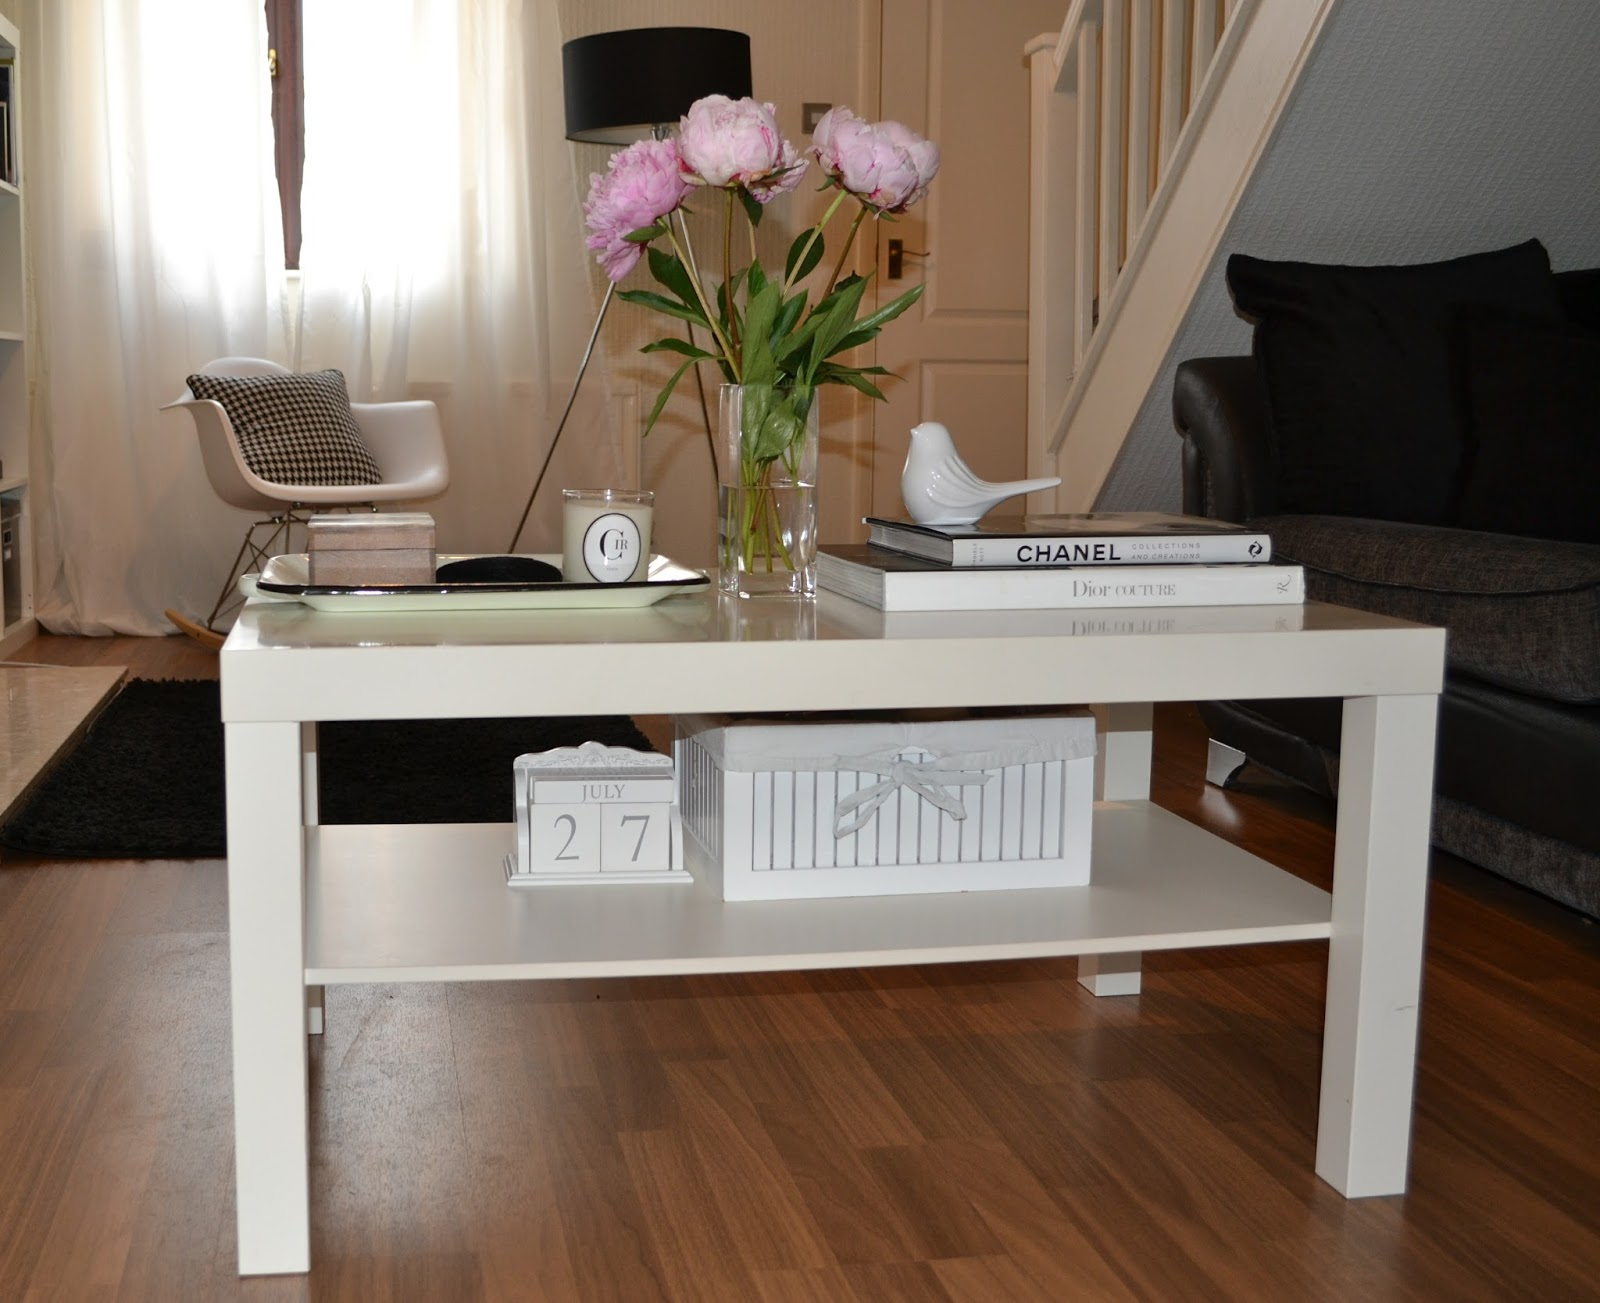 ikea lack coffee table Ikea Lack Coffee Table In White | Coffee Tables ikea lack coffee table